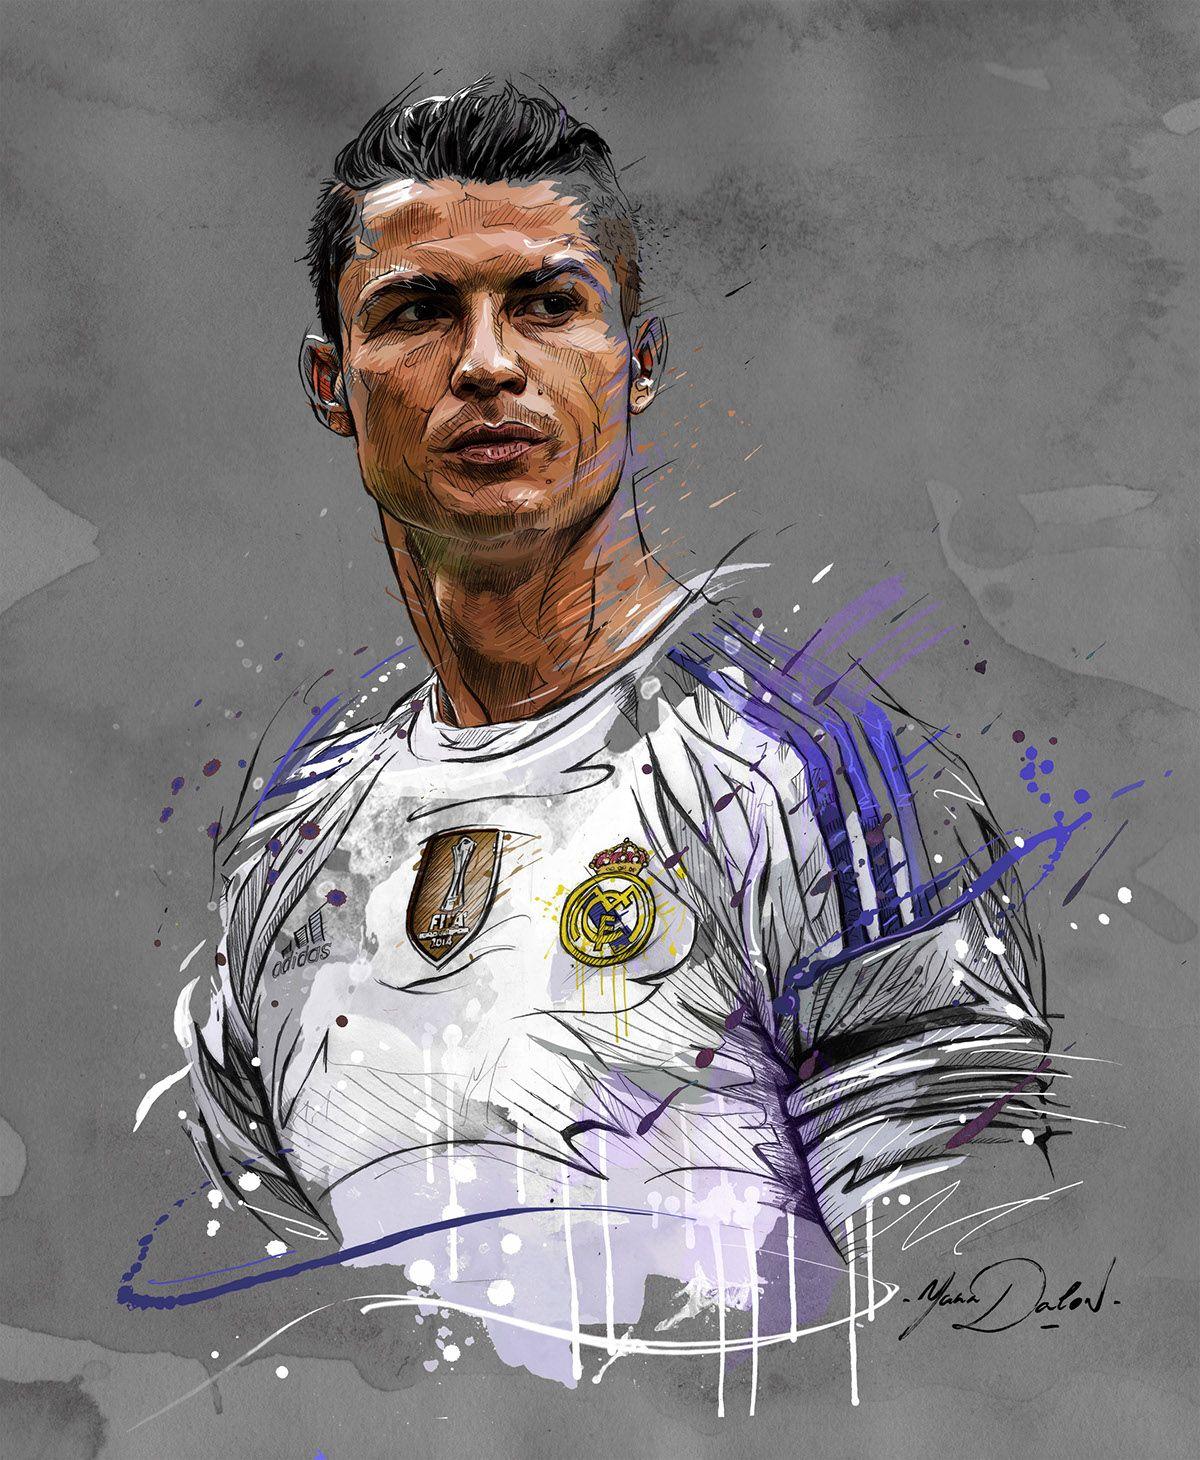 Cristiano Ronaldo Wallpaper: My Painting Of Cristiano Ronaldo.